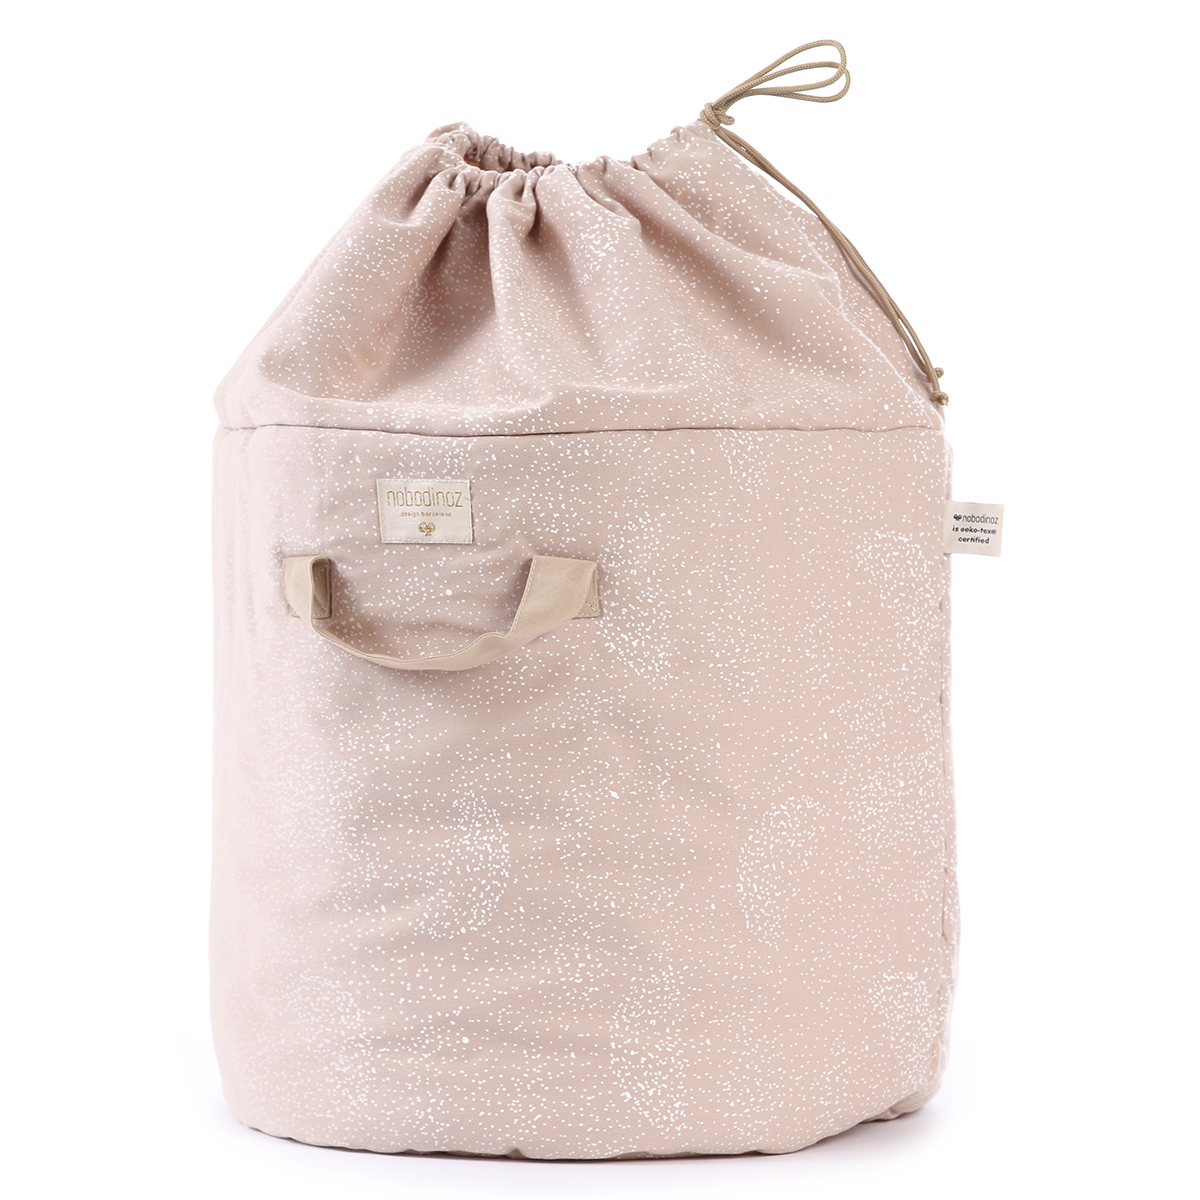 Rangement jouet Sac à Jouets Bamboo - White Bubble & Misty Pink